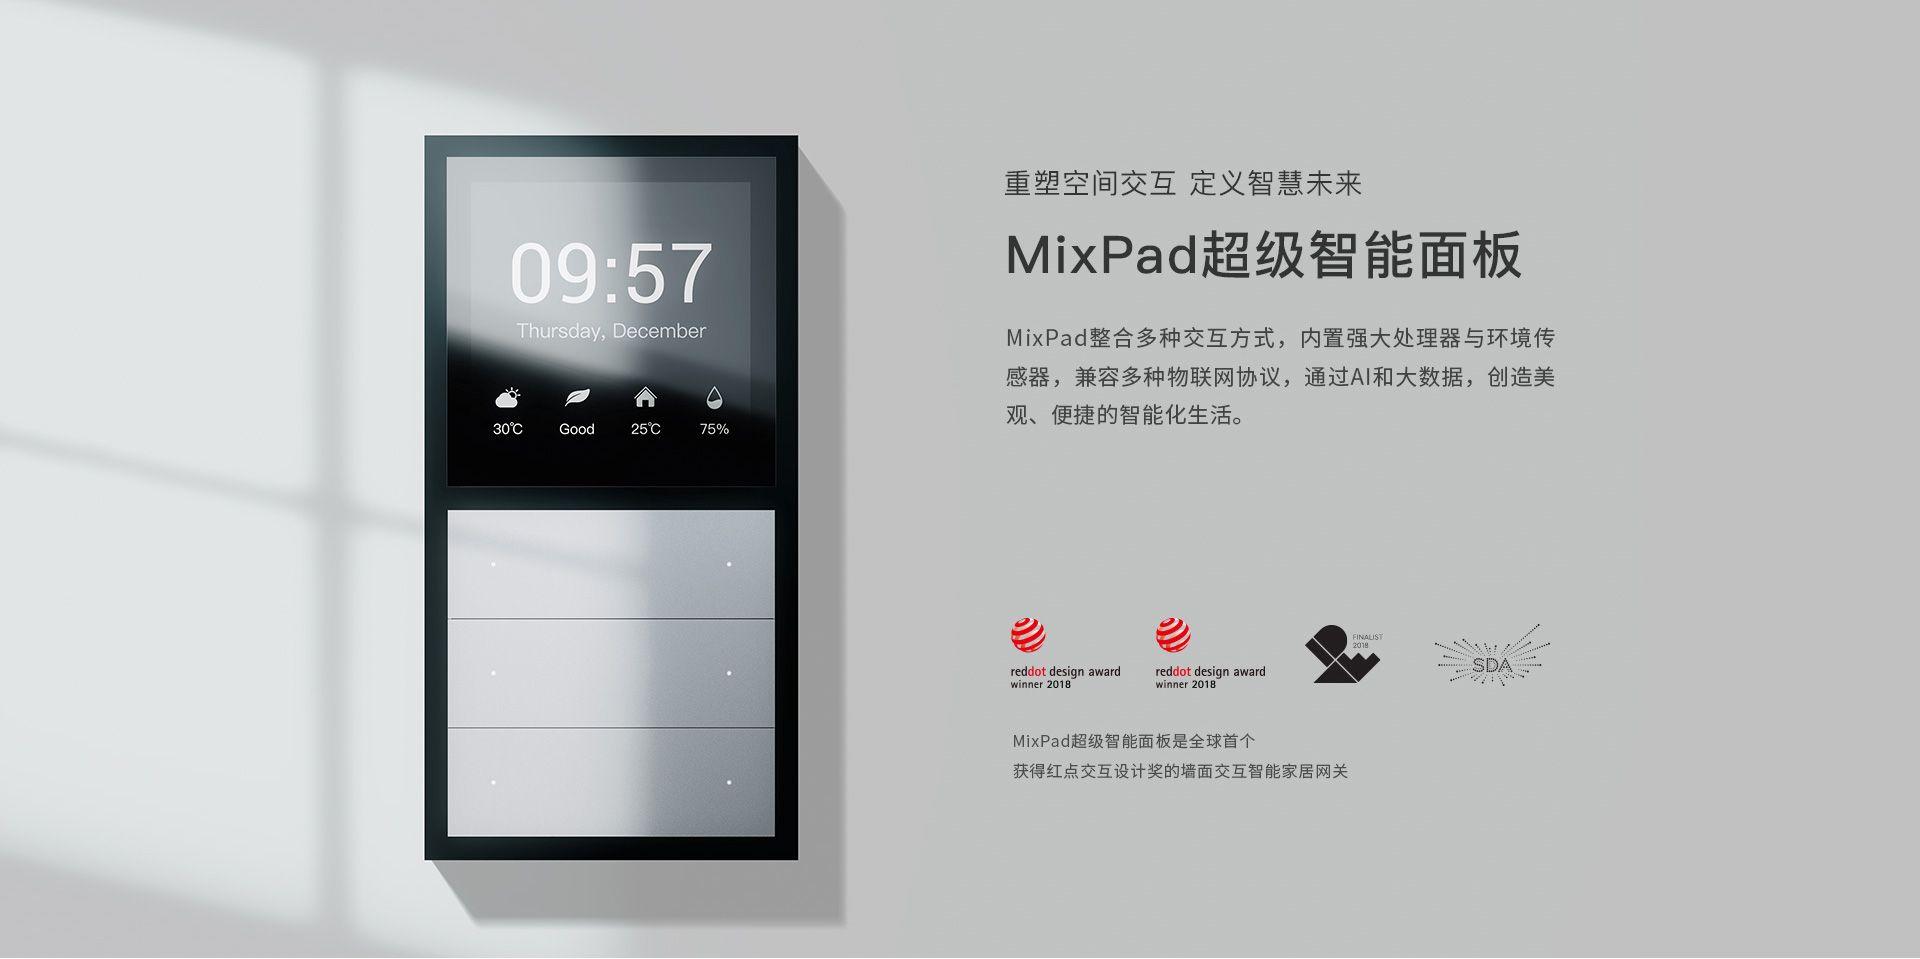 MixPad超级智能面板